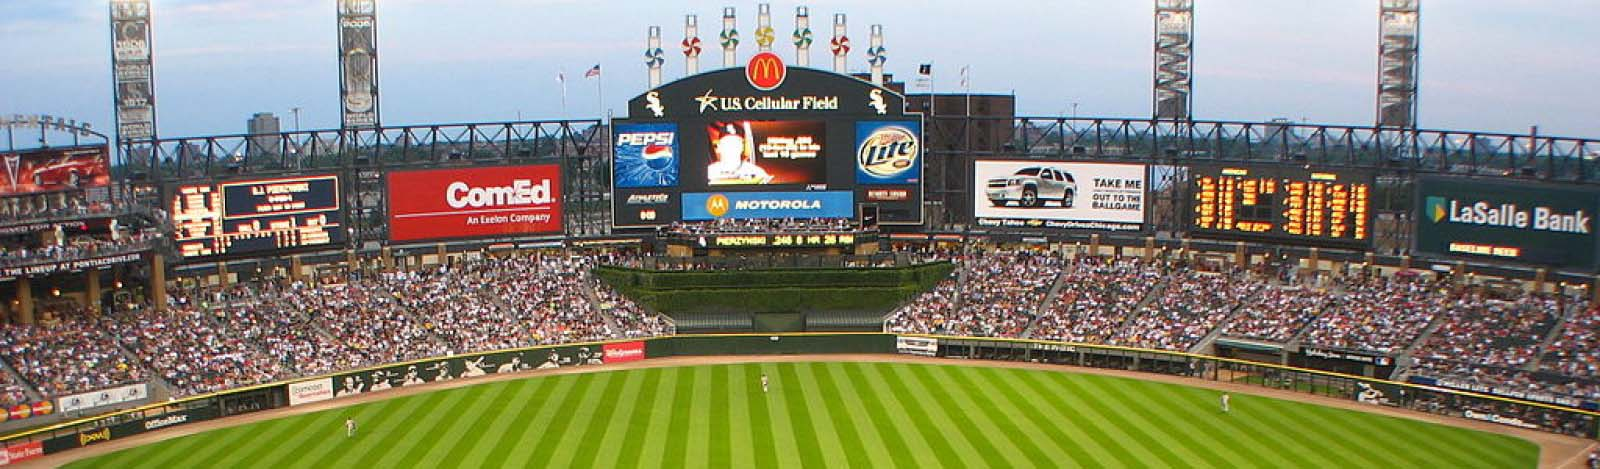 chicago, us cellular field